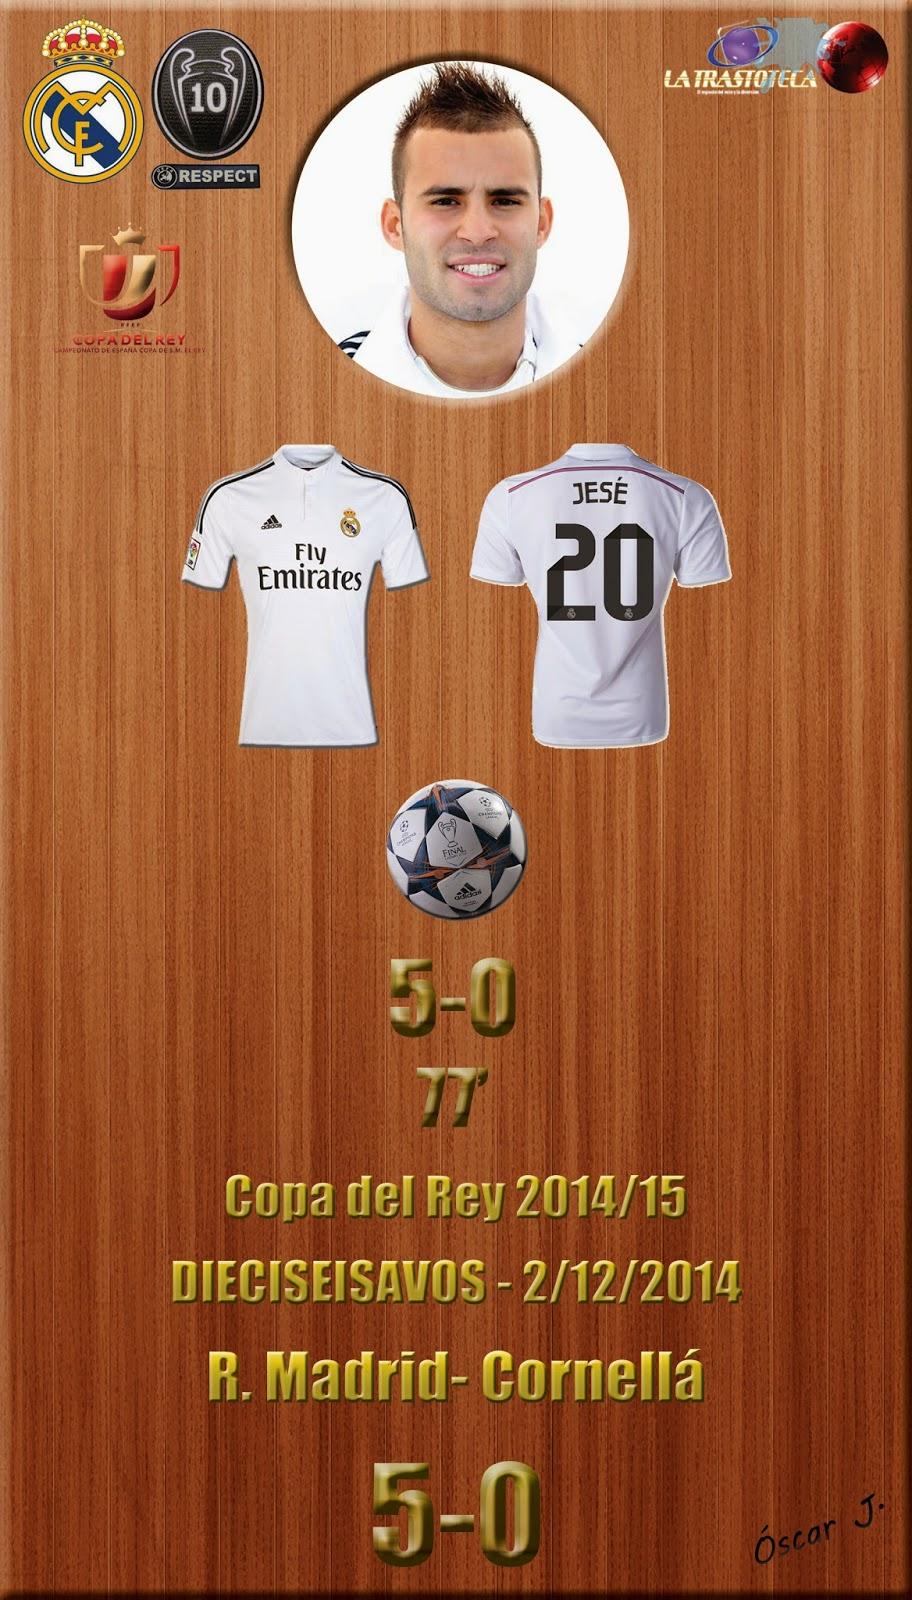 Jesé (5-0) - Real Madrid 5-0 Cornellá - Copa del Rey 2014/15 - Dieciseisavos - (2/12/2014)